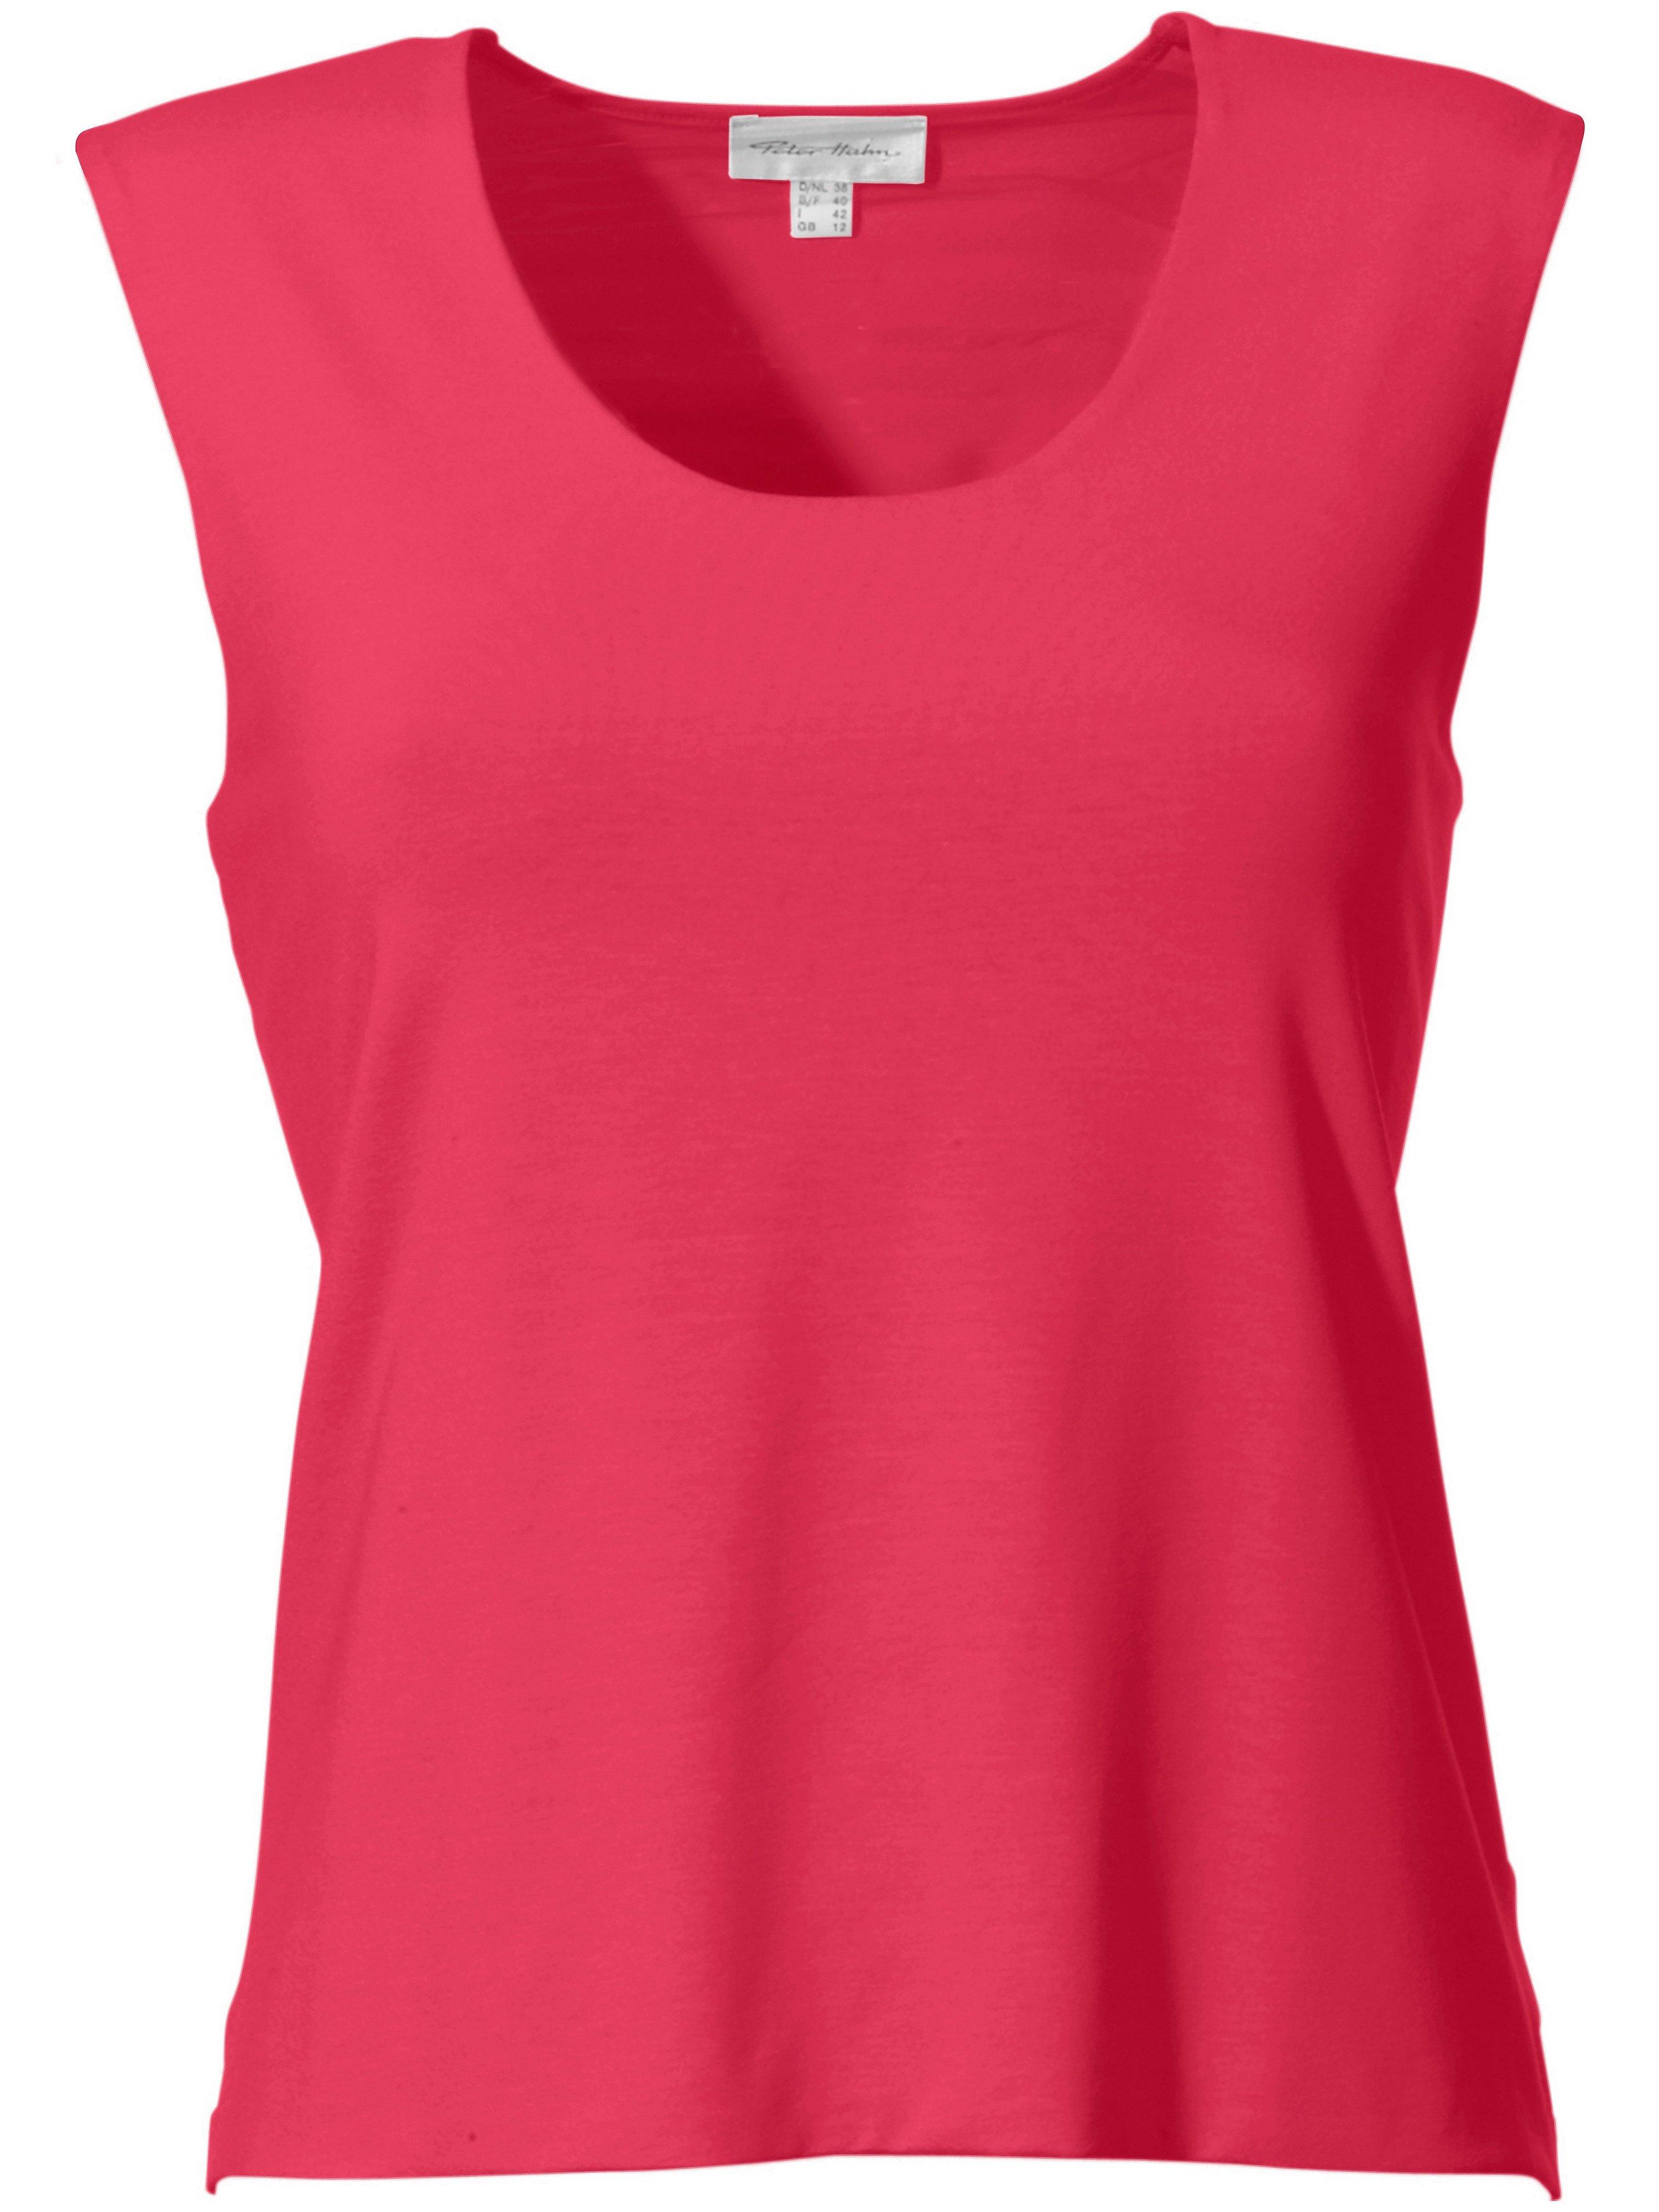 Round neck top short sleeves Peter Hahn bright pink